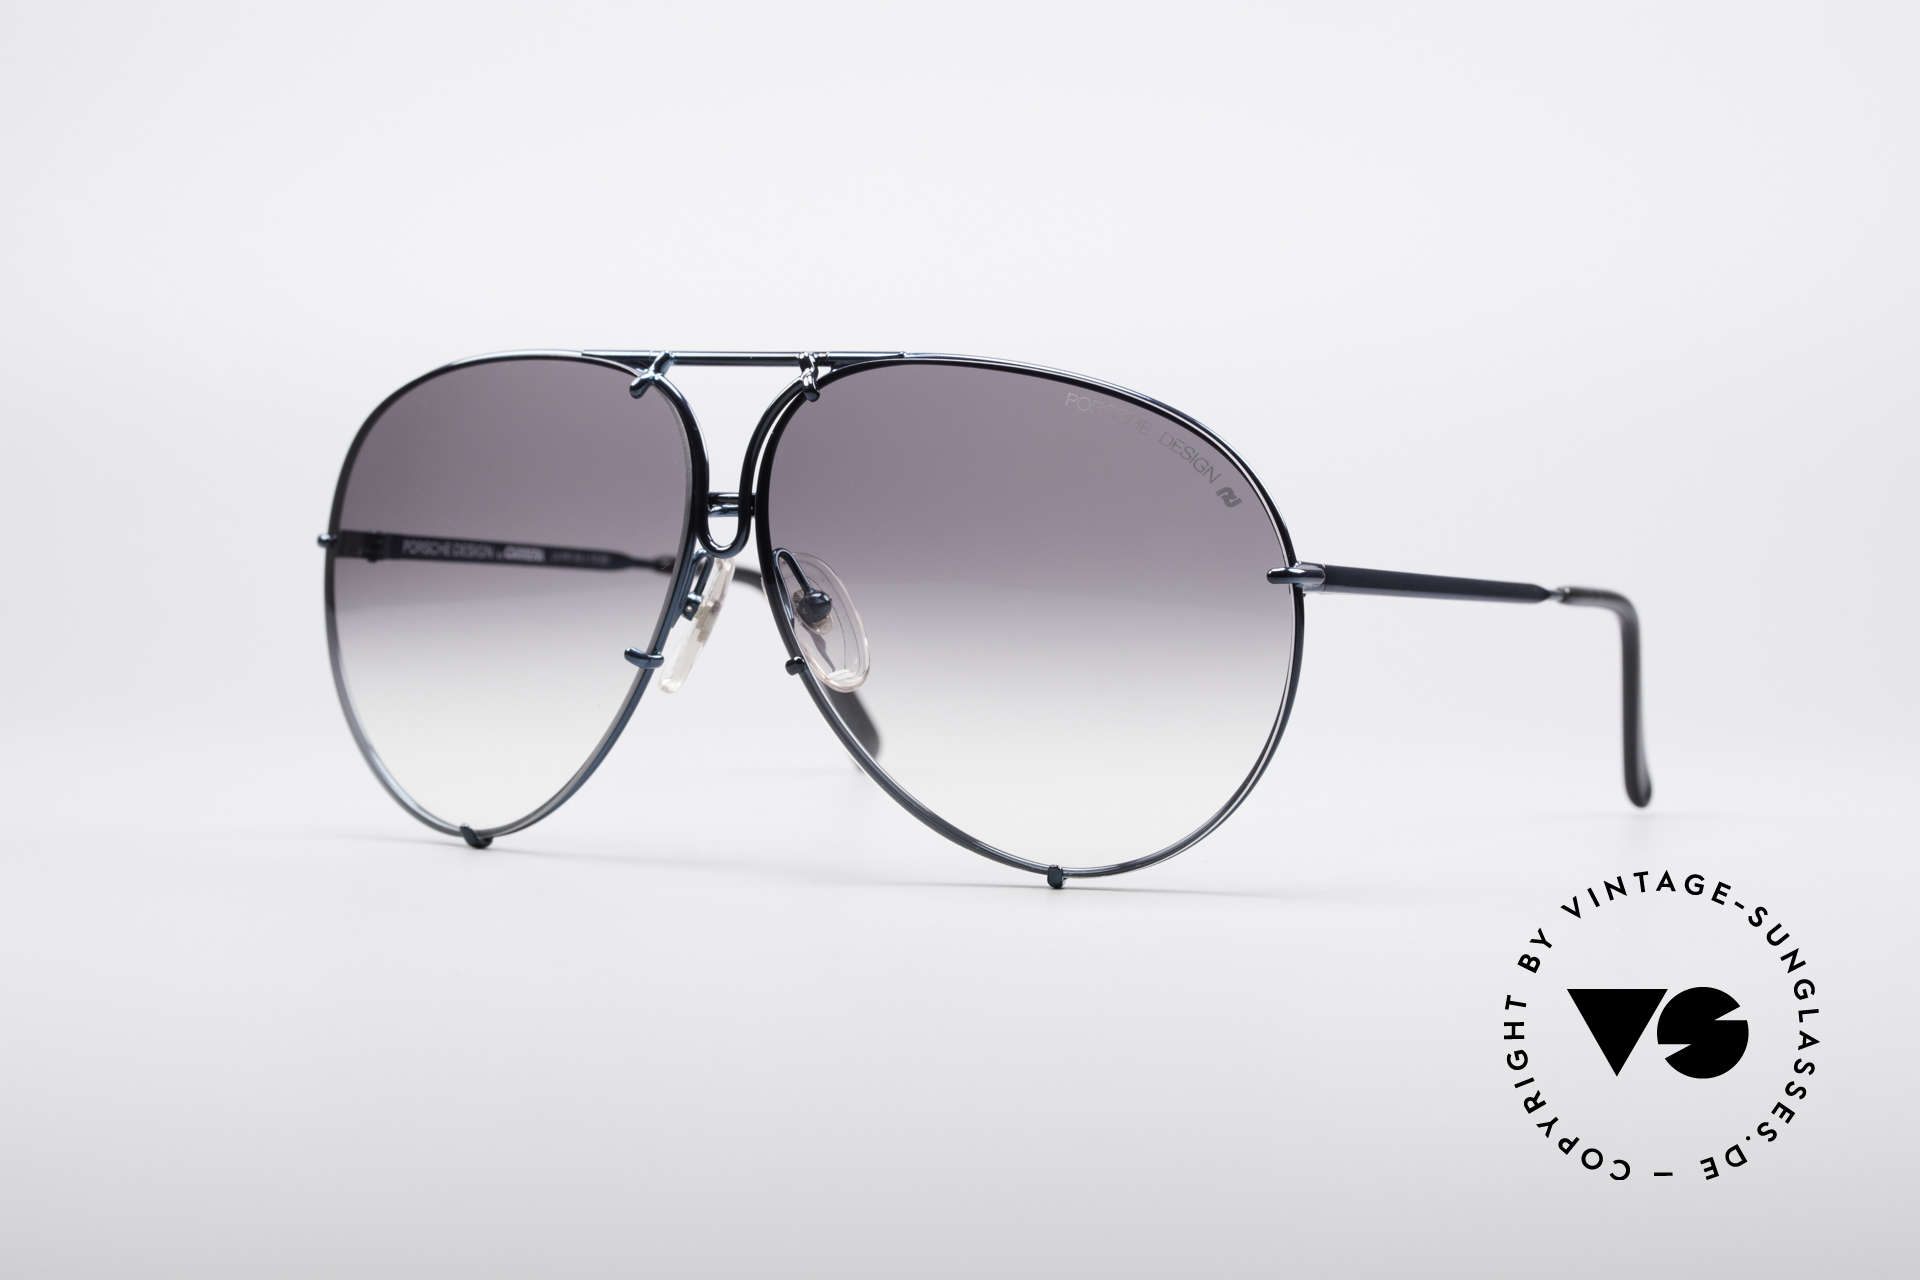 Porsche 5623 80's Aviator Sunglasses, vintage Porsche Design by Carrera shades from 1987, Made for Men and Women